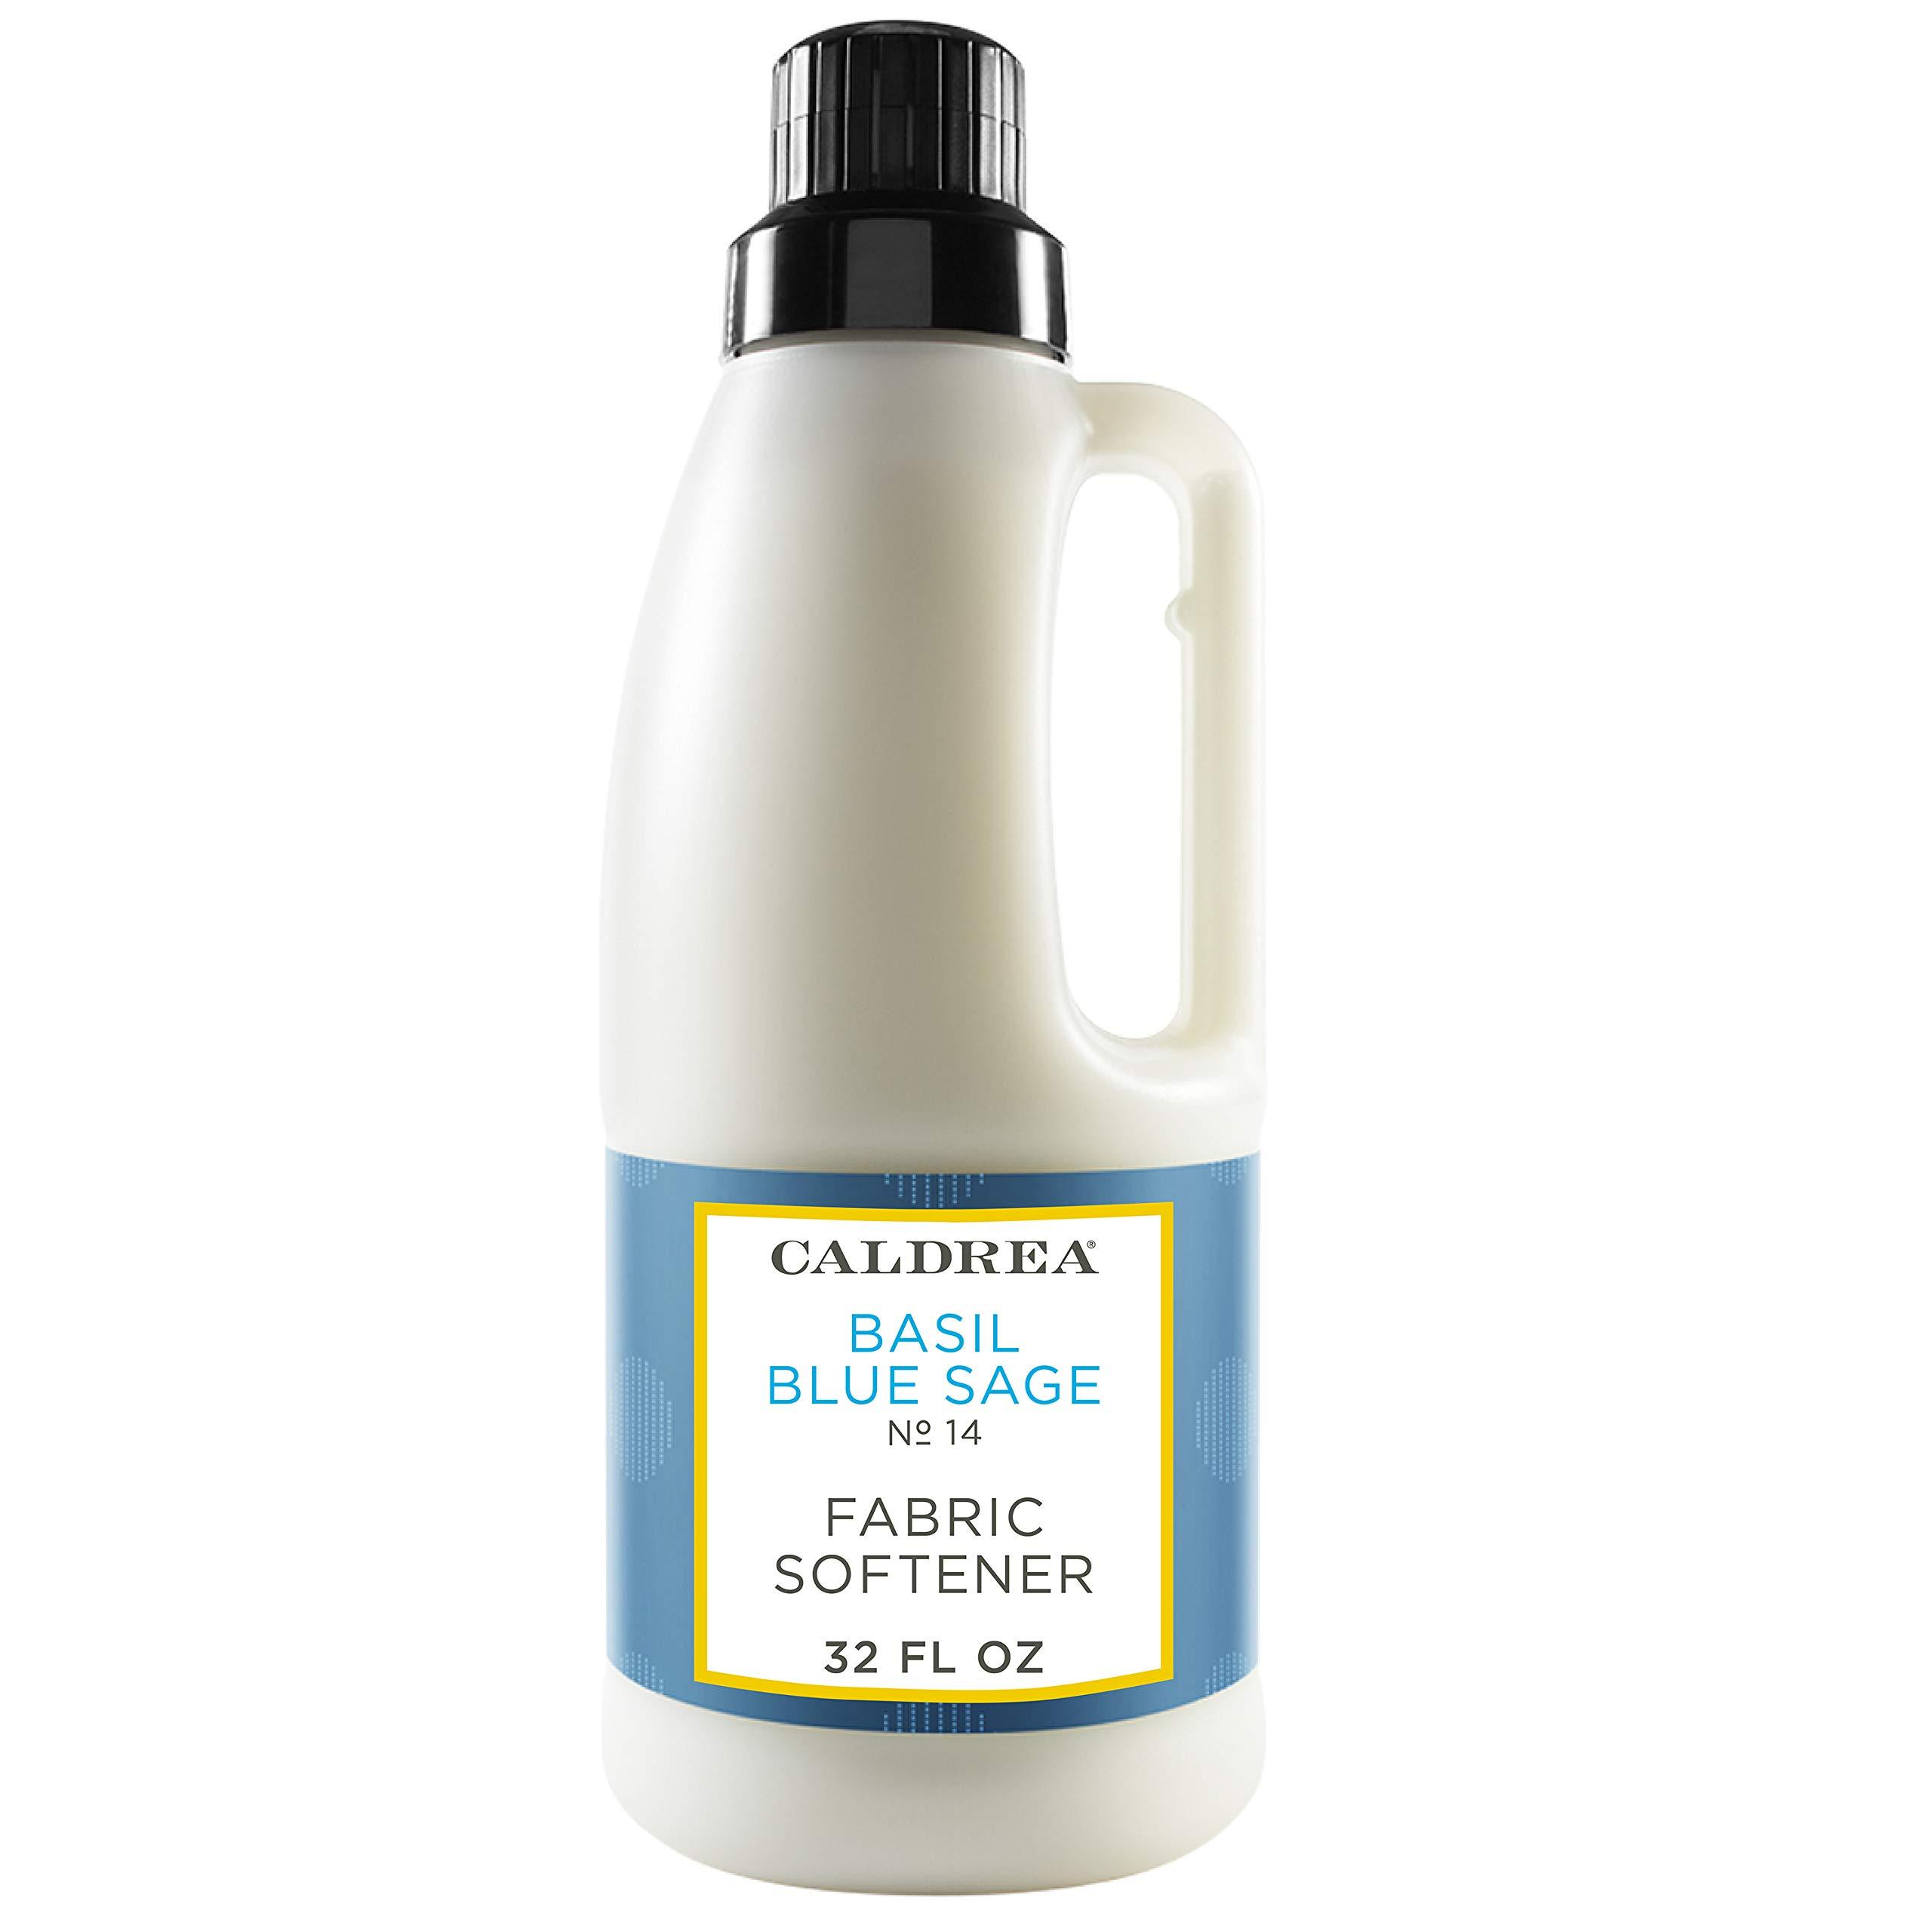 Caldrea Fabric Softener, Basil Blue Sage, 32 oz